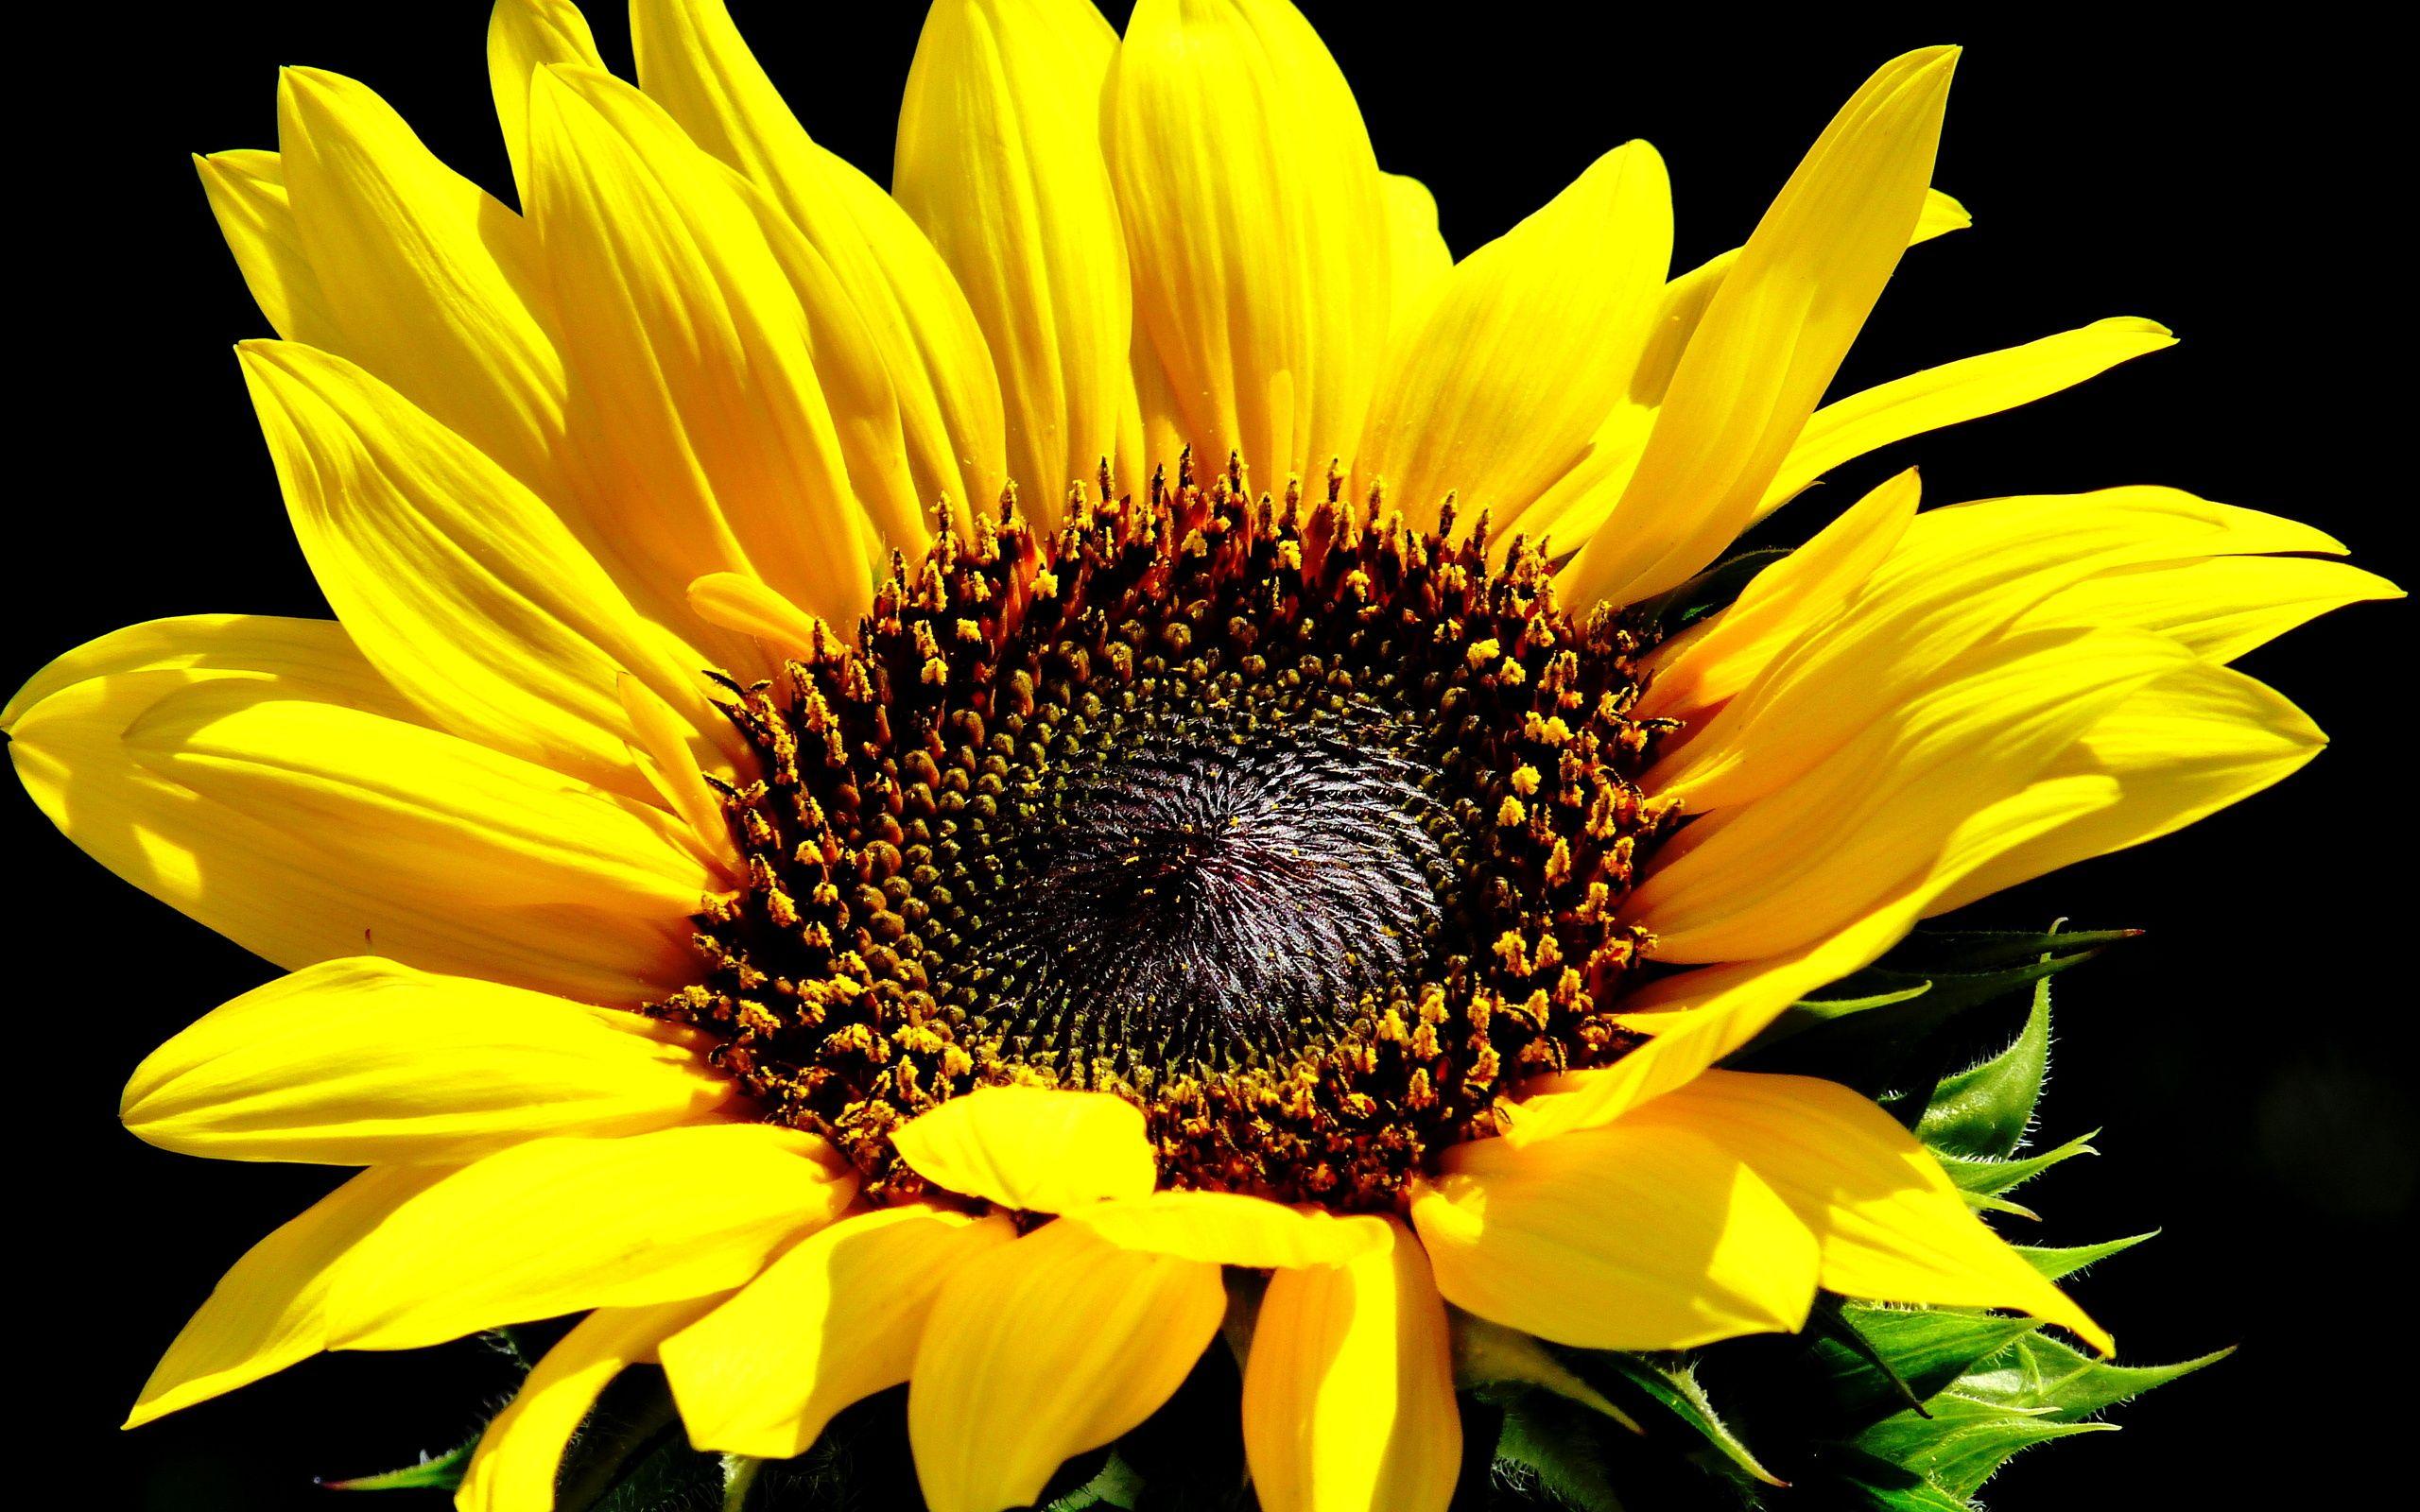 423703 Jpg 2560 1600 Sunflower Photography Sunflower Images Sunflower Wallpaper